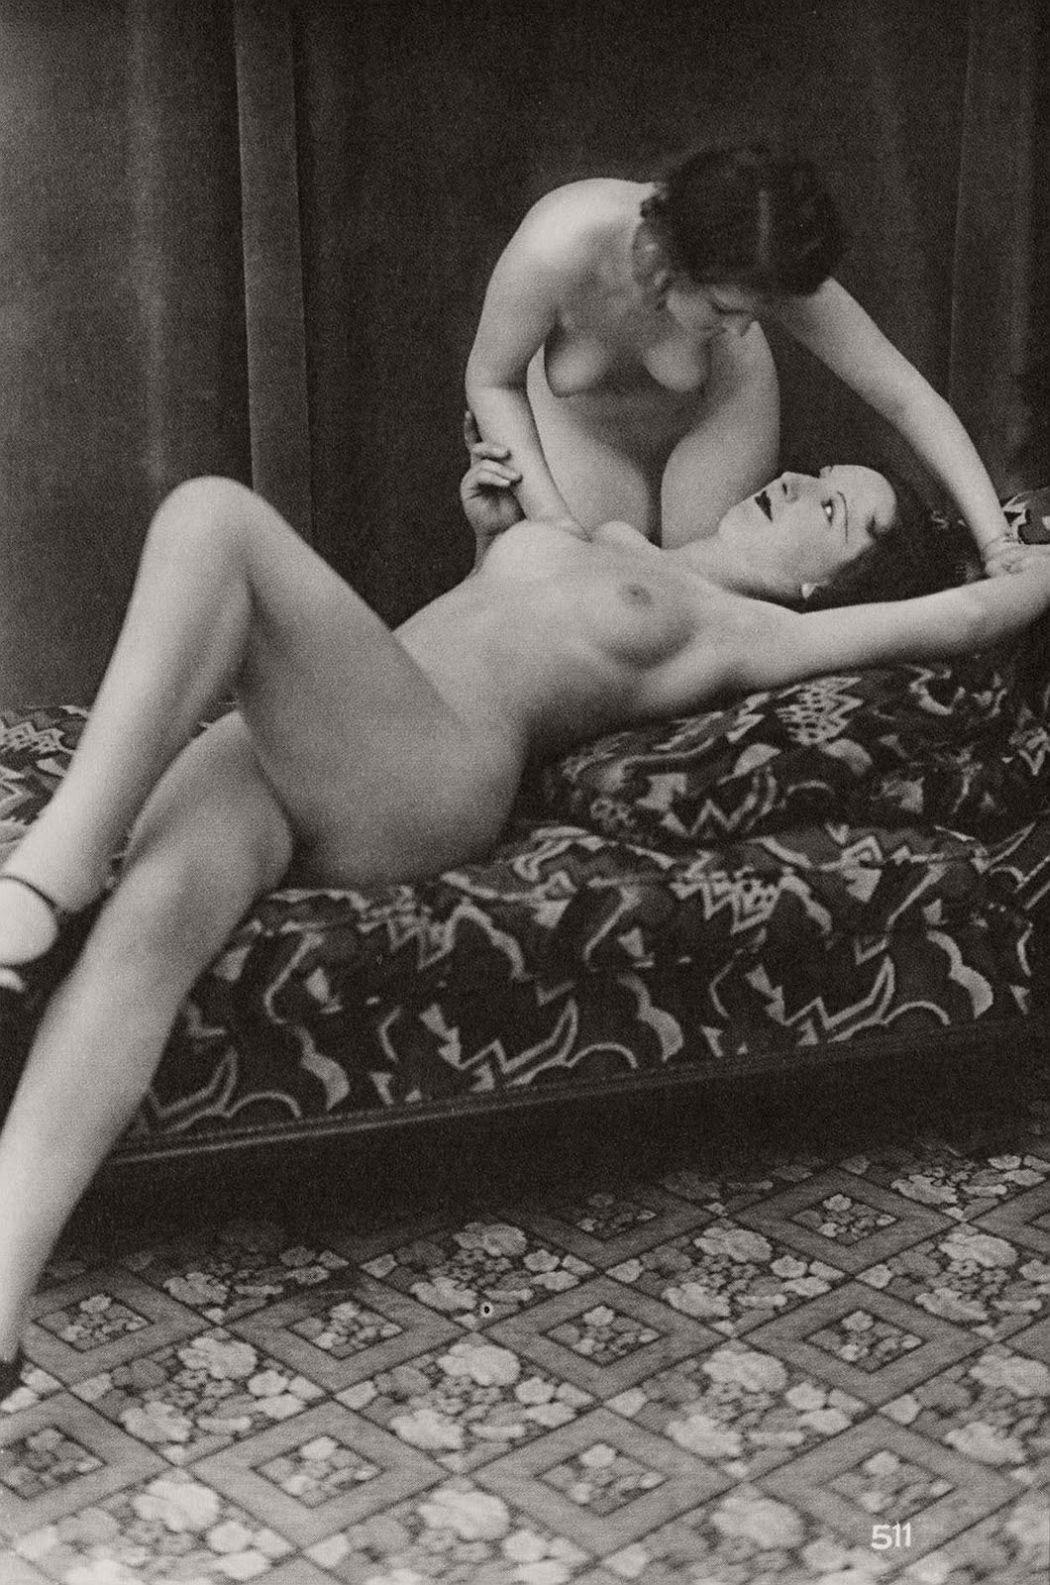 Klasične Vintage Lezbične Eroticanudes 1930S Monovision-1265